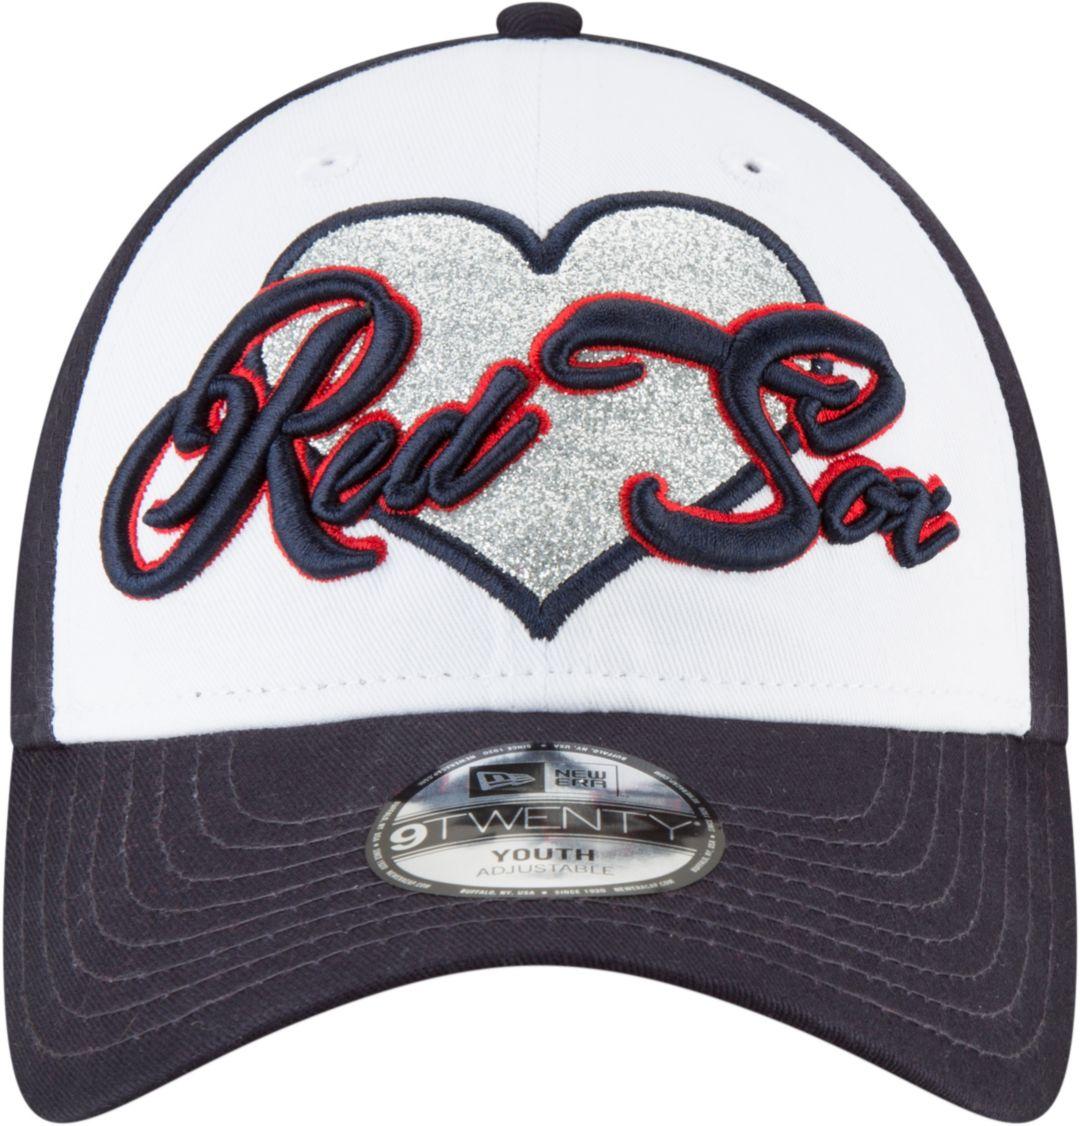 wholesale dealer bbd34 7f392 New Era Youth Boston Red Sox 9Twenty Sparkly Fan Adjustable Hat.  noImageFound. Previous. 1. 2